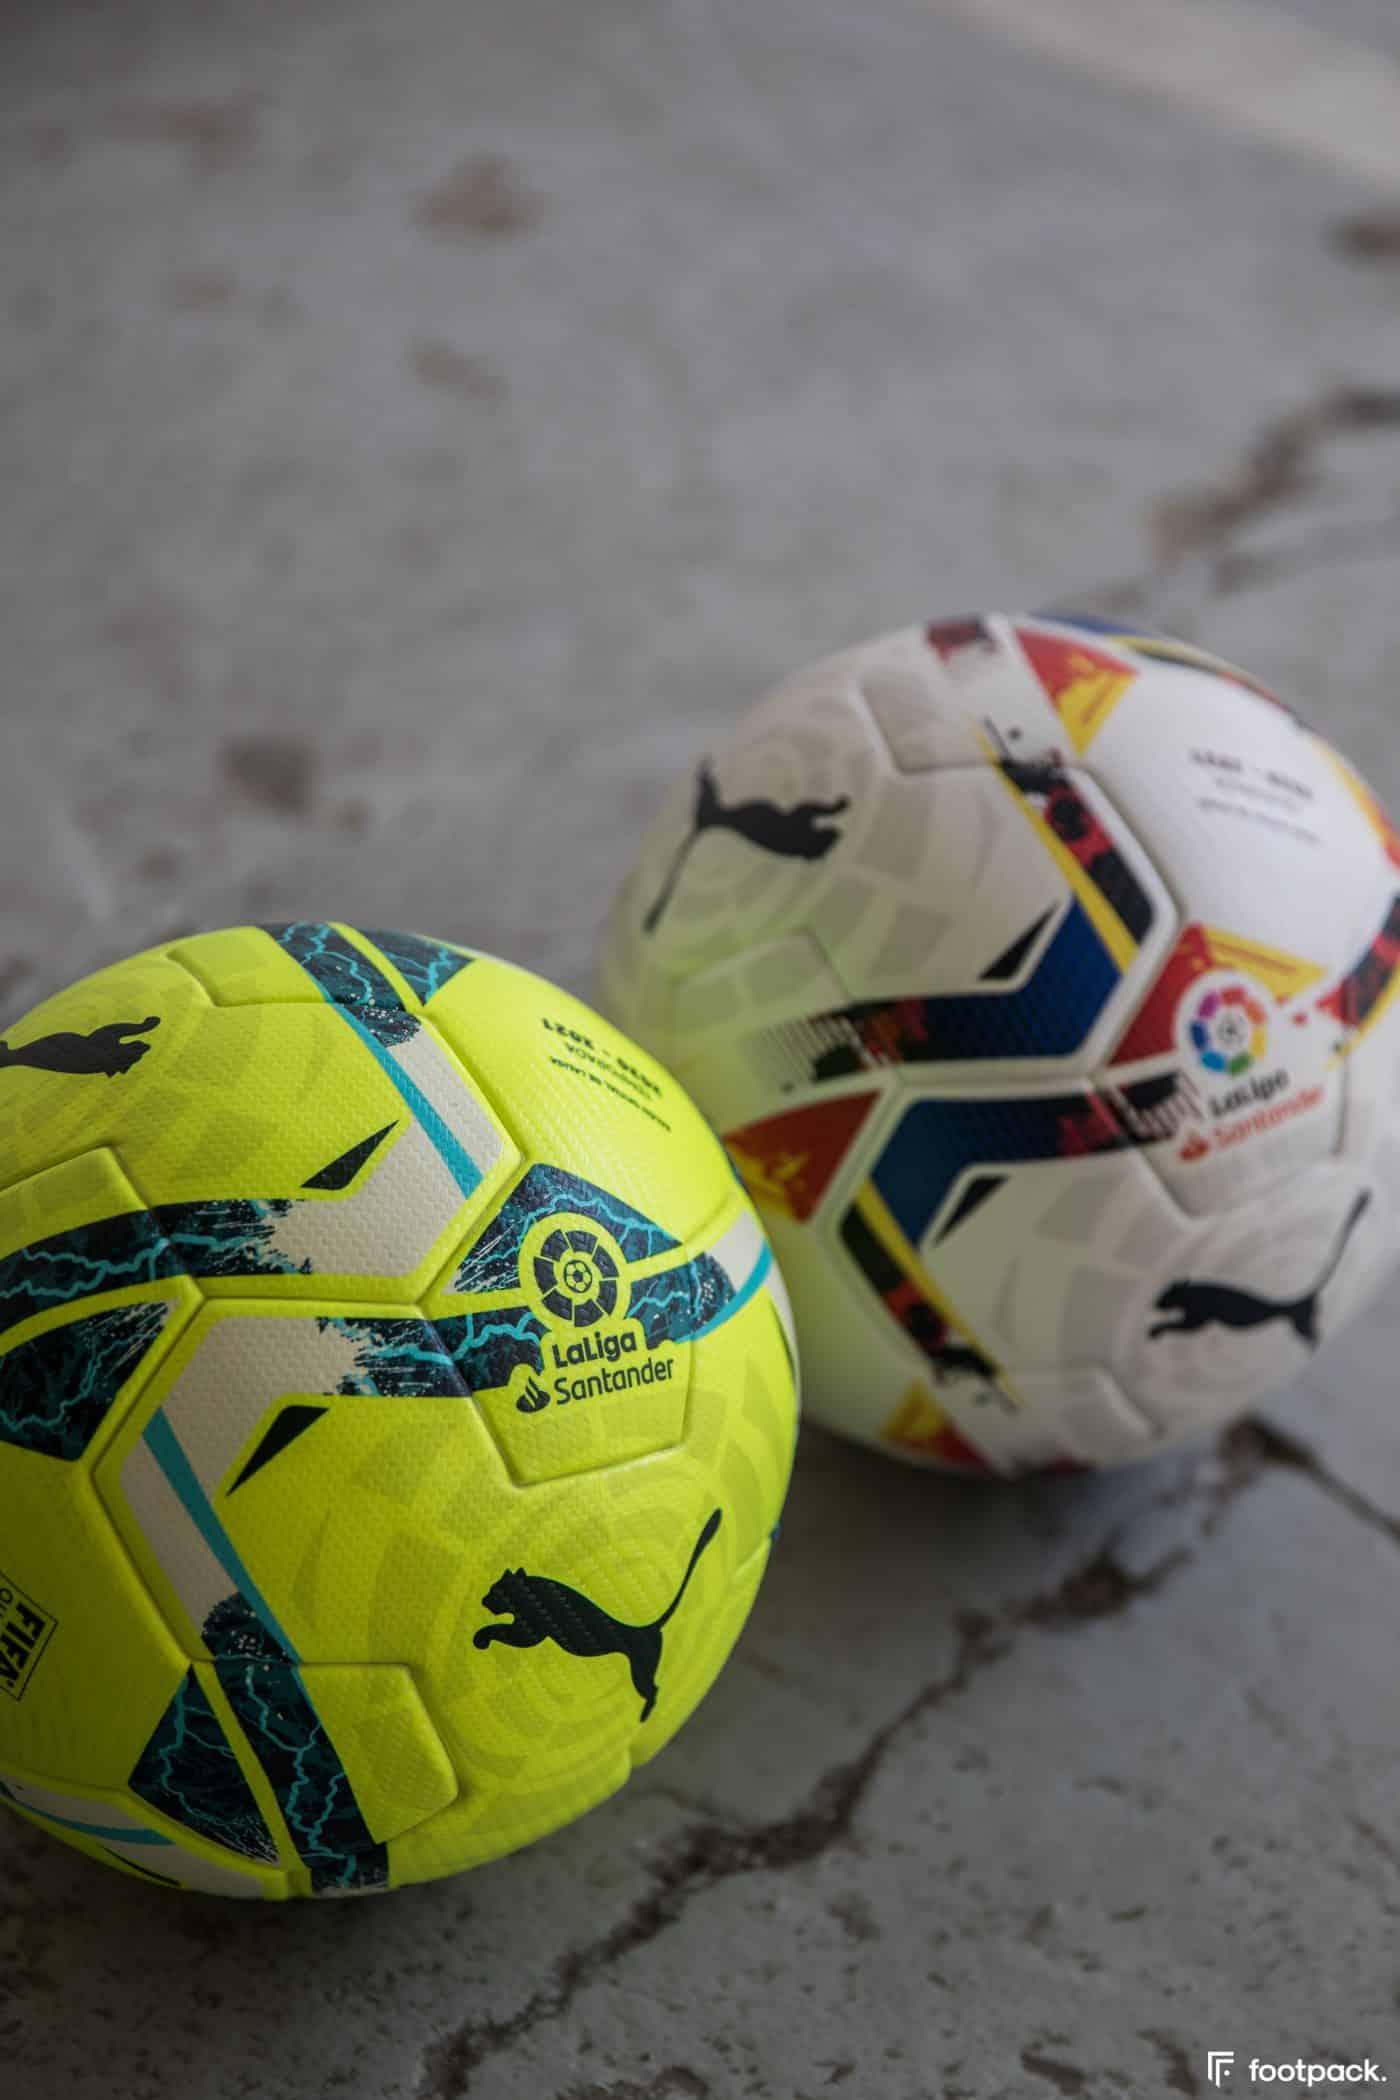 ballon-championnat-espagne-la-liga-2020-2021-puma-footpack-14